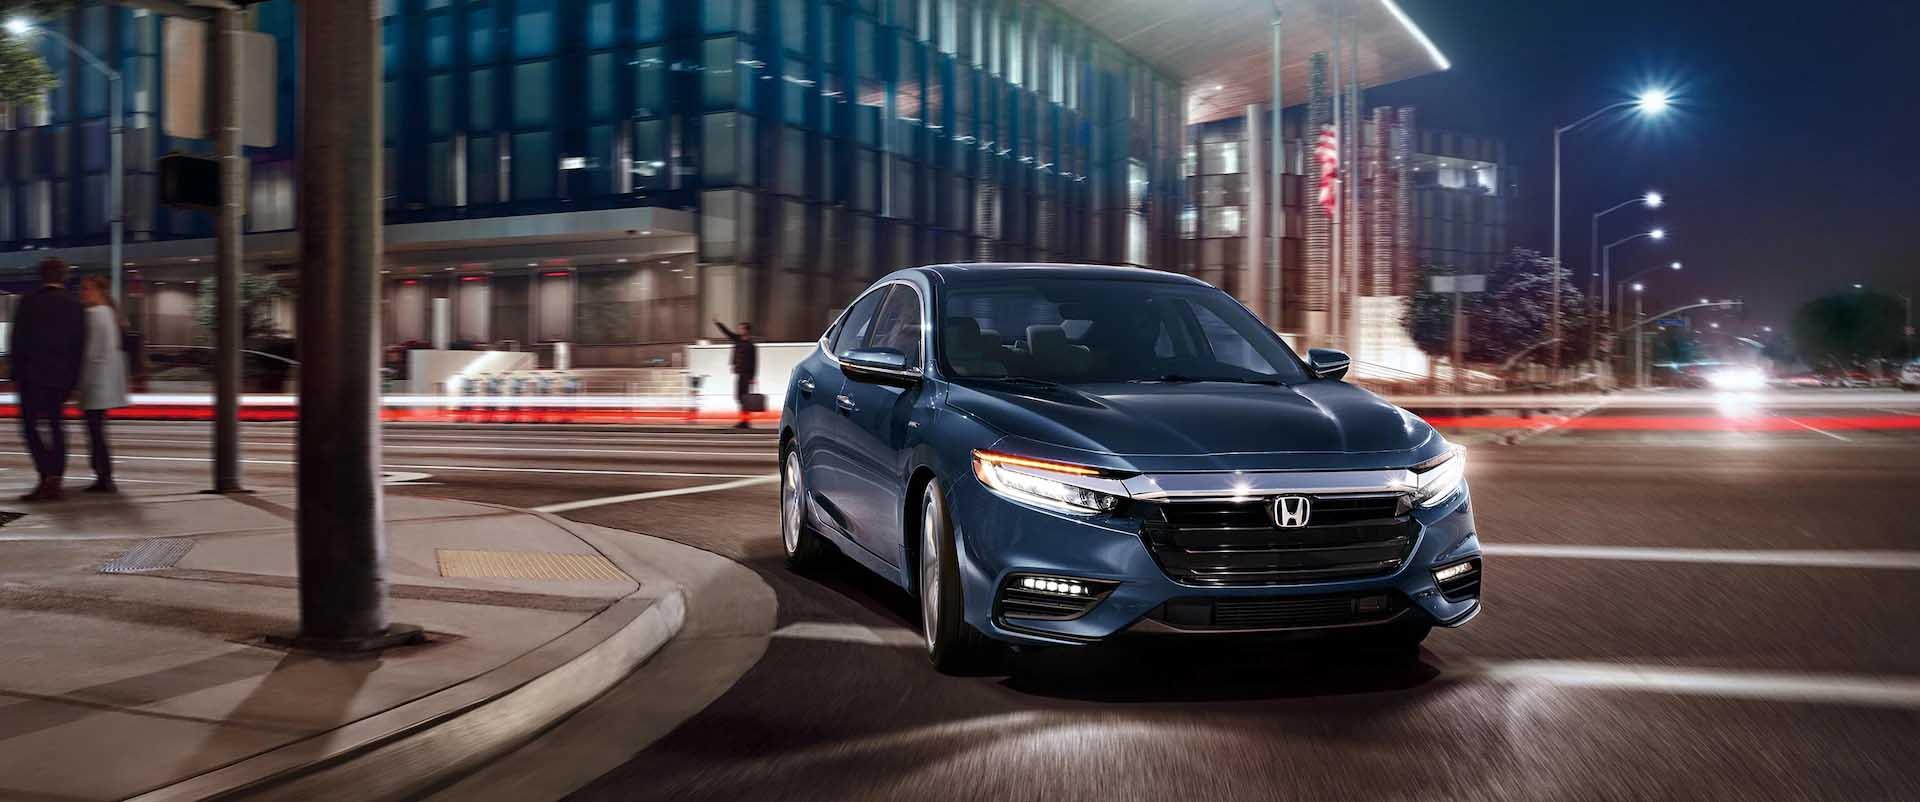 Meet The New 2021 Honda Insight In Midland, Texas